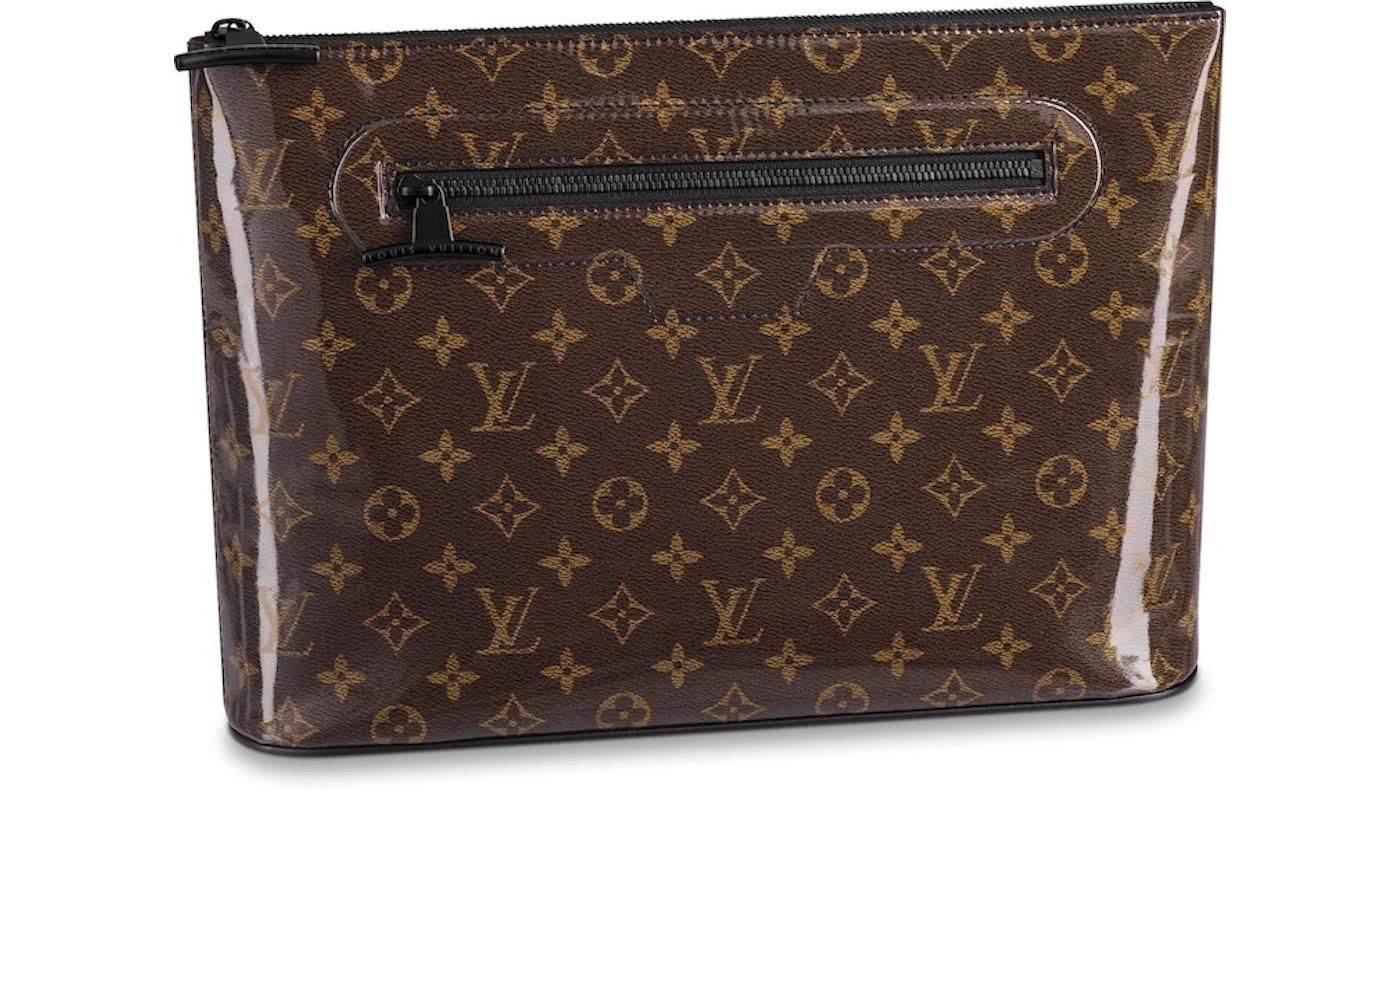 4b20ce8d288 Louis Vuitton Pochette Cosmos Monogram Brown